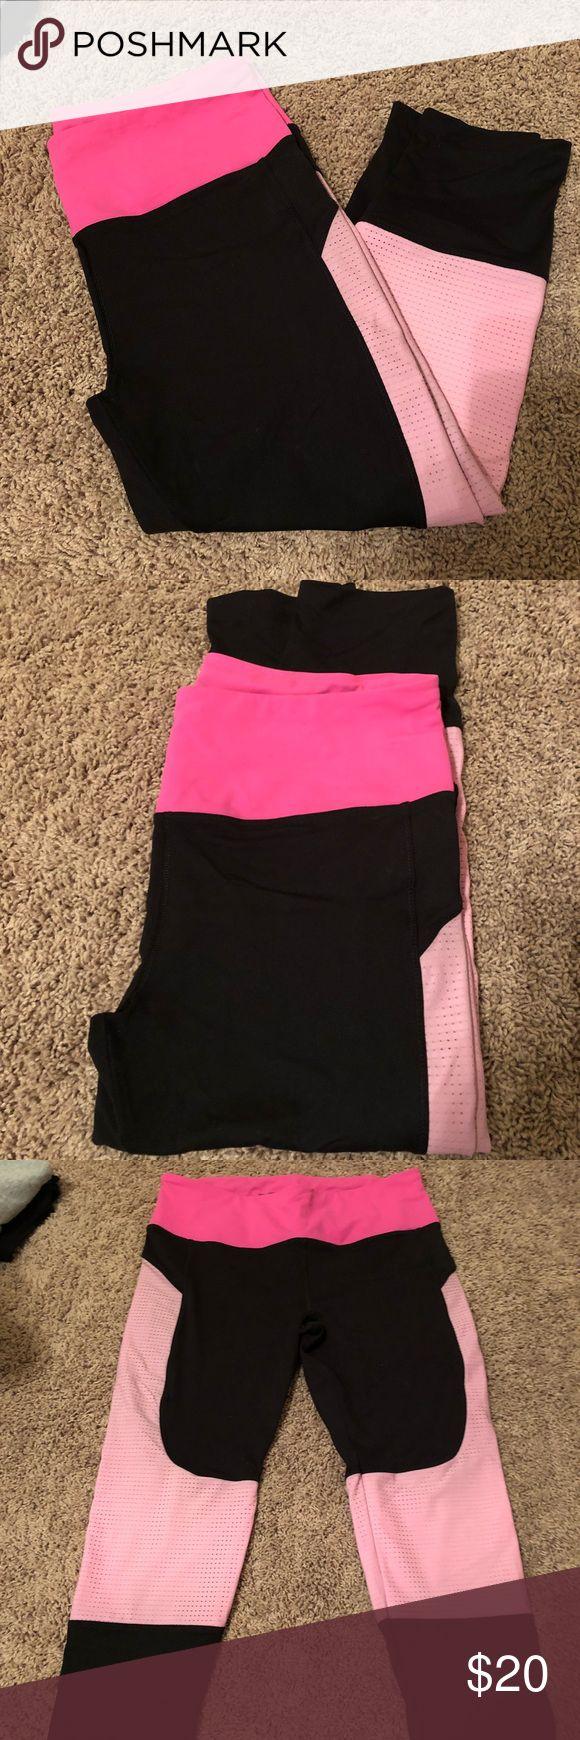 Victoria's Secret large black and pink capris. Victoria's Secret sport. Black and pink leggings. Size large. Excellent condition. Victoria's Secret Pants Leggings